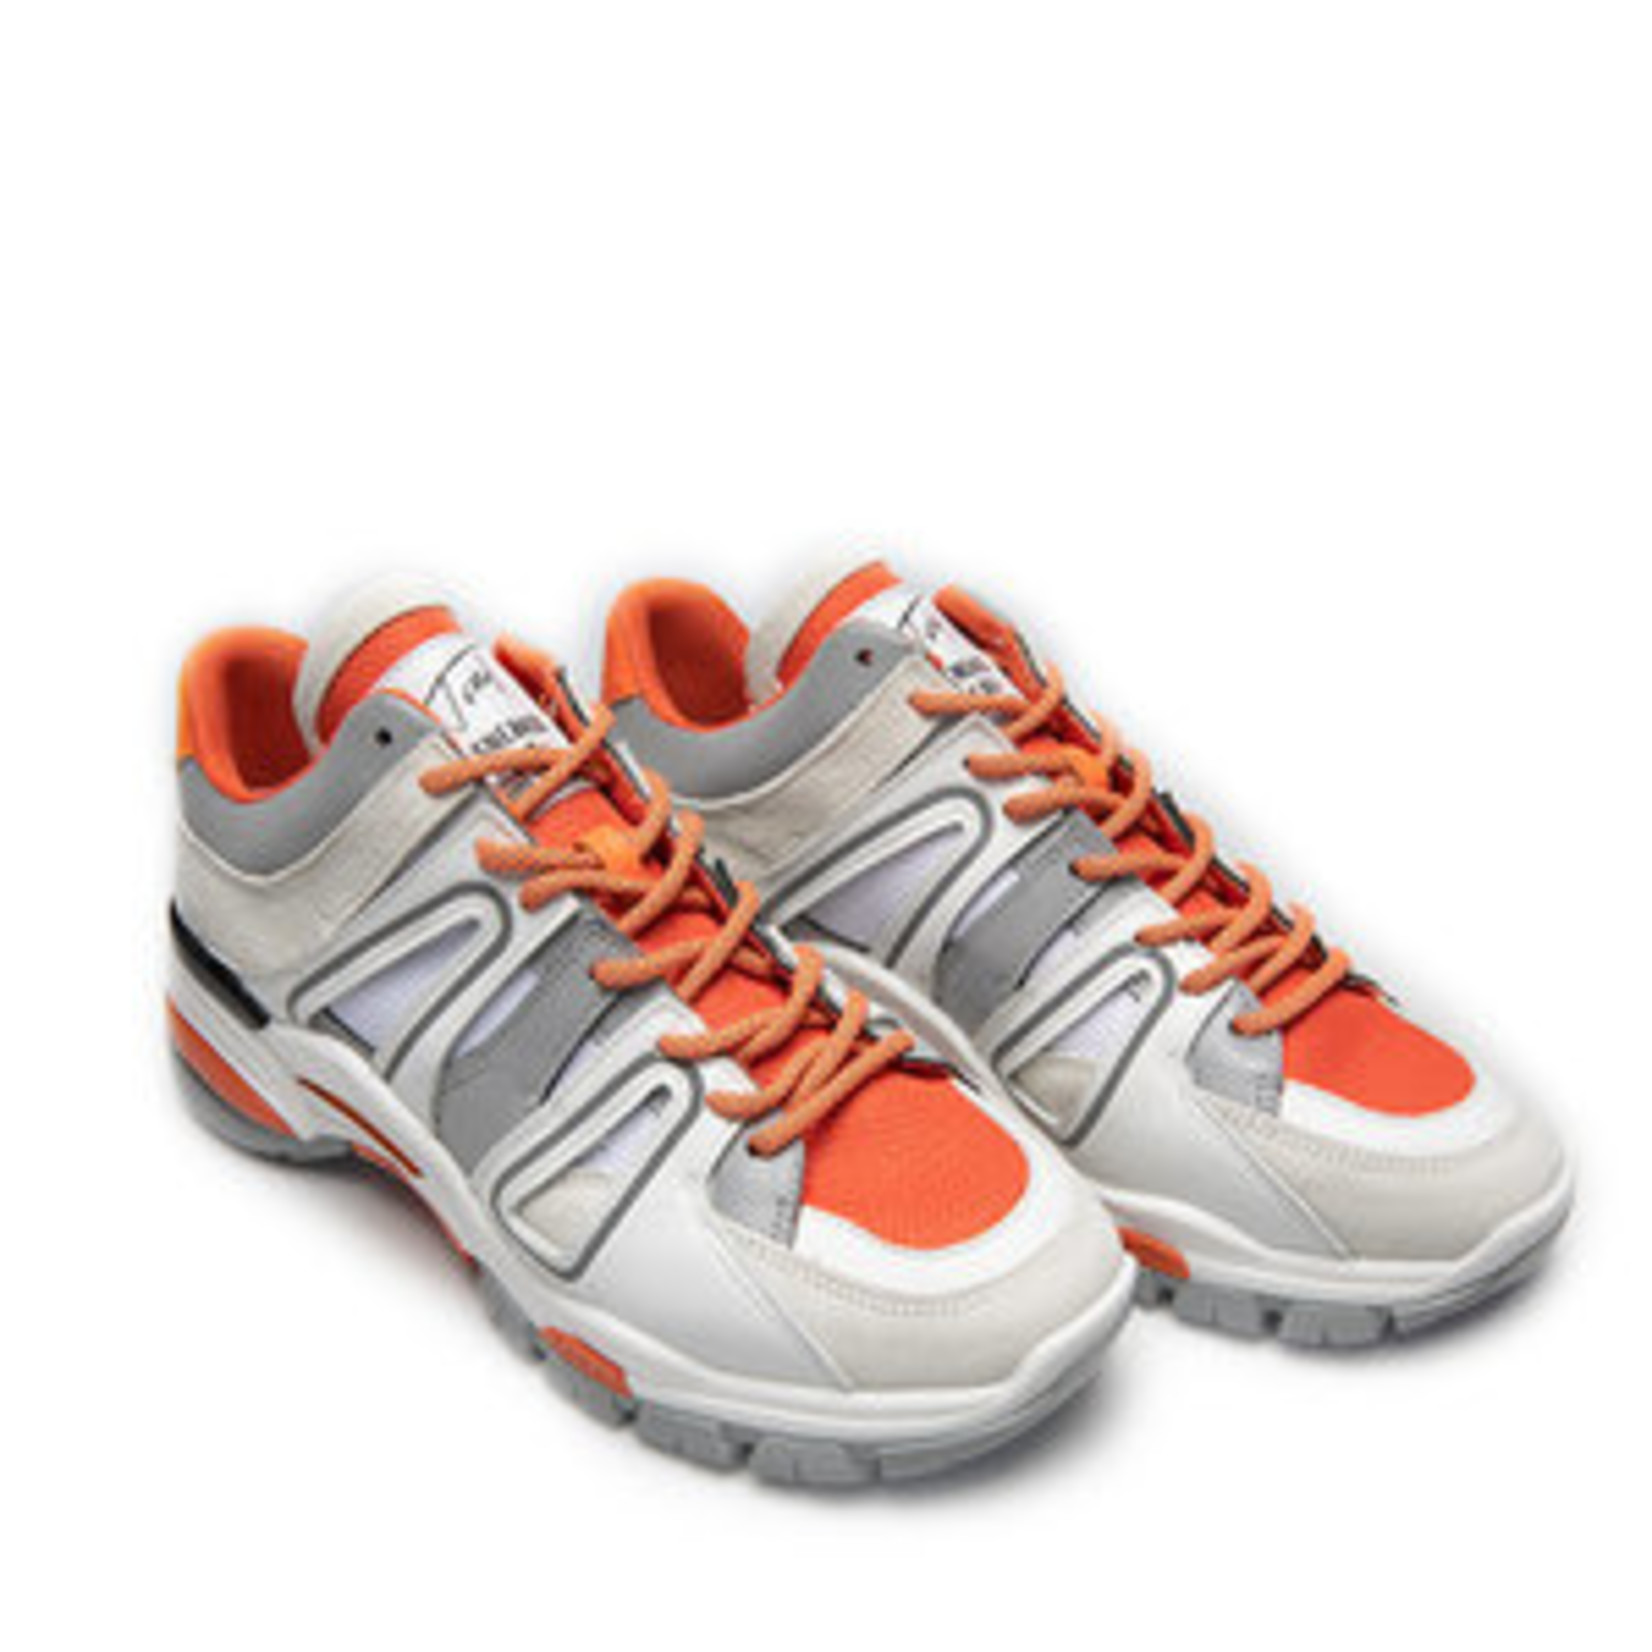 Toral Toral Sneaker